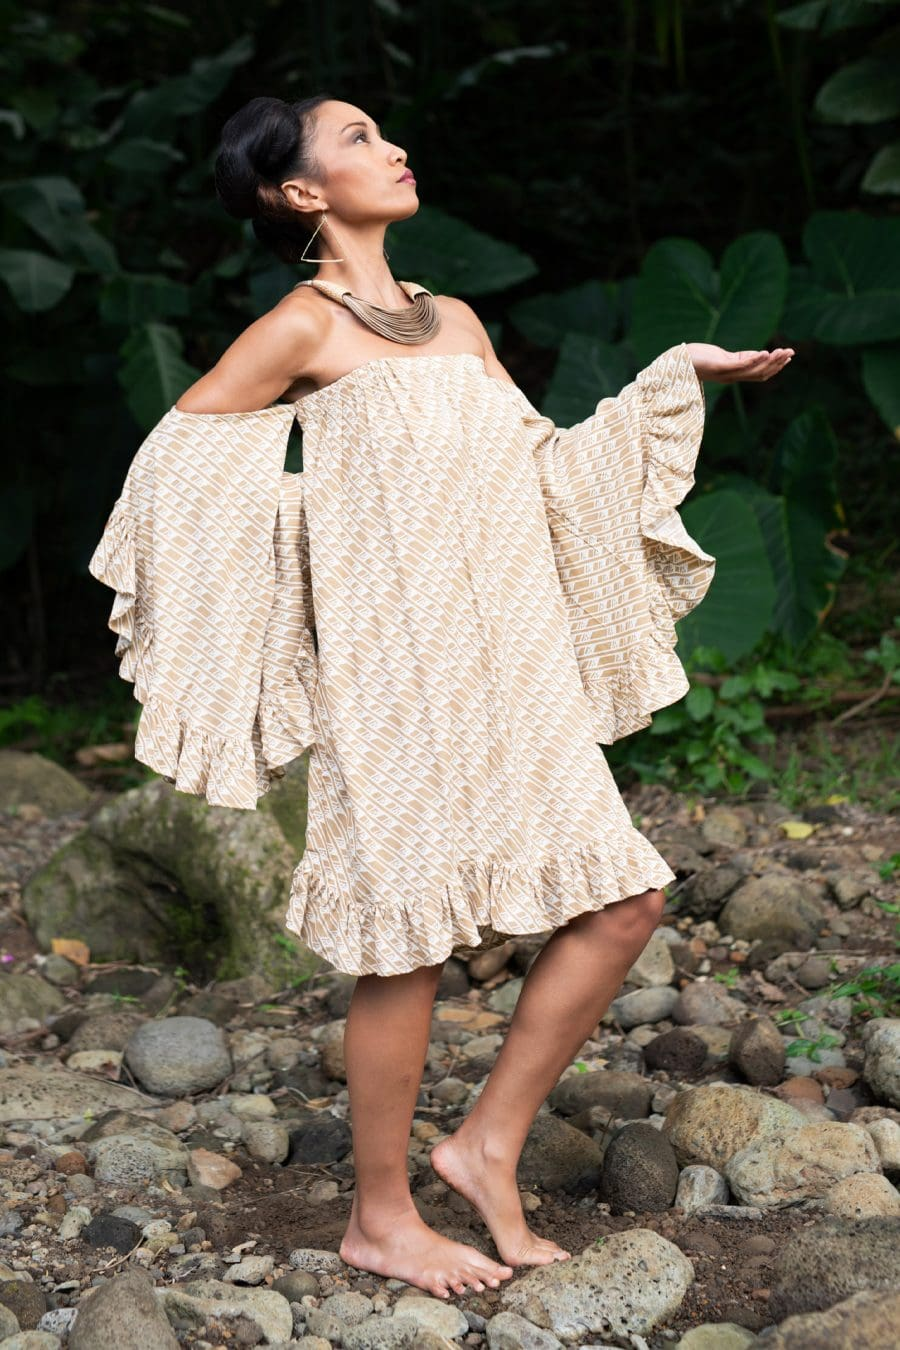 Model wearing Leinani Dress in Tannin/Moonbeam Hulu Nene - Front View